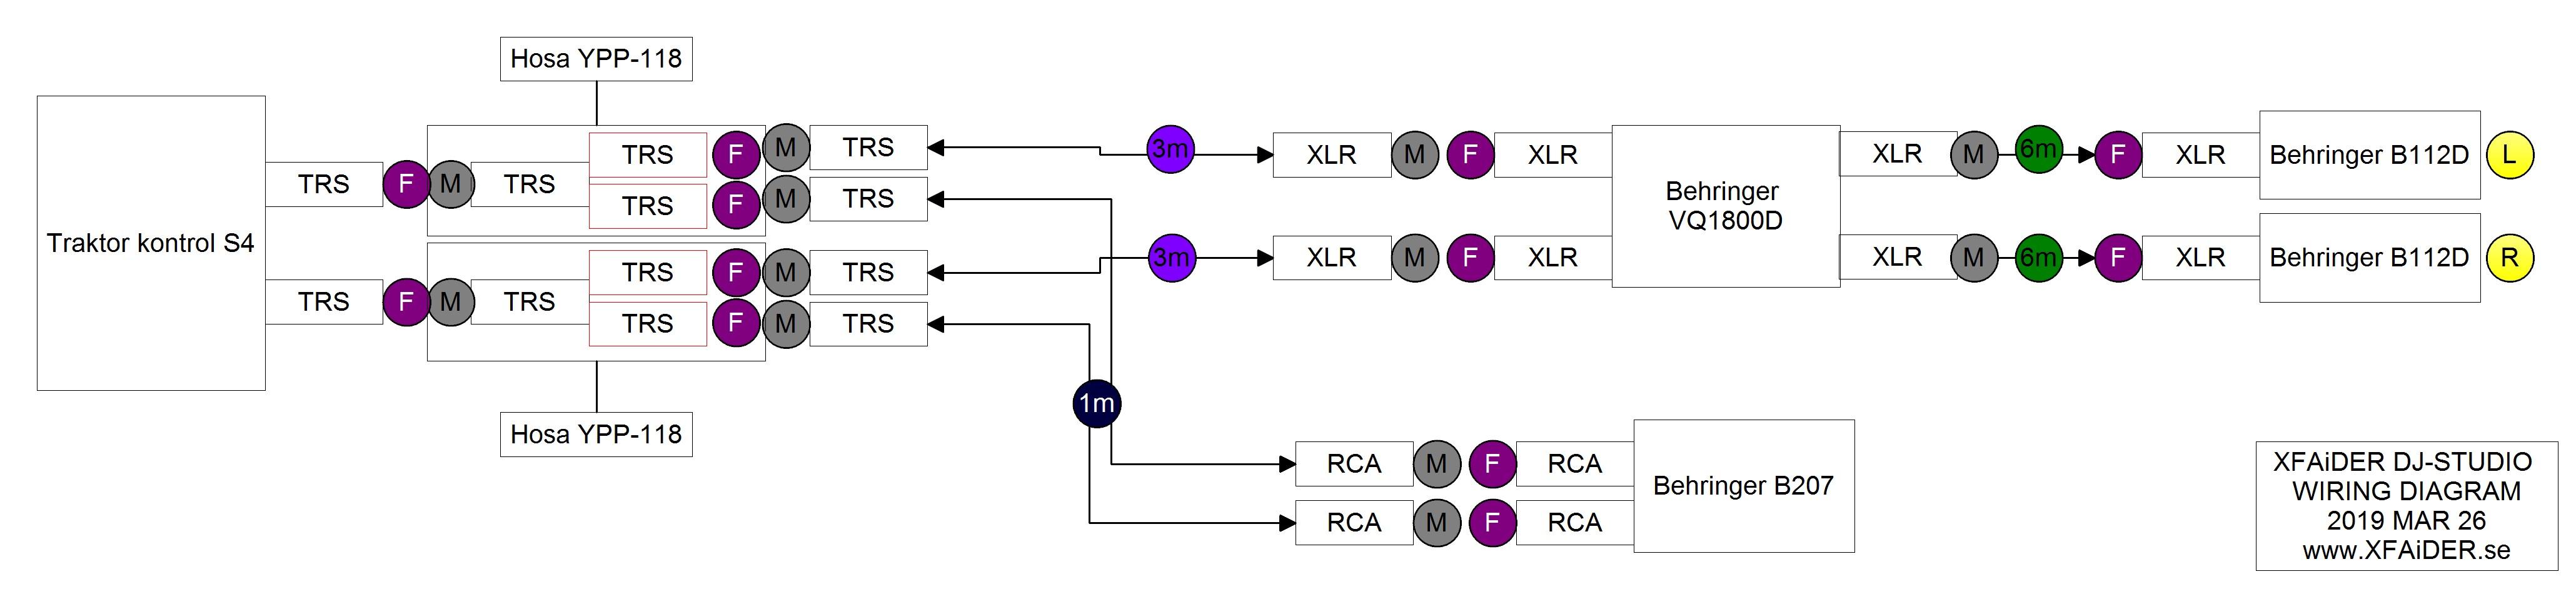 dj-studio – ≡[xfaider]≡ dj wiring diagram  xfaider